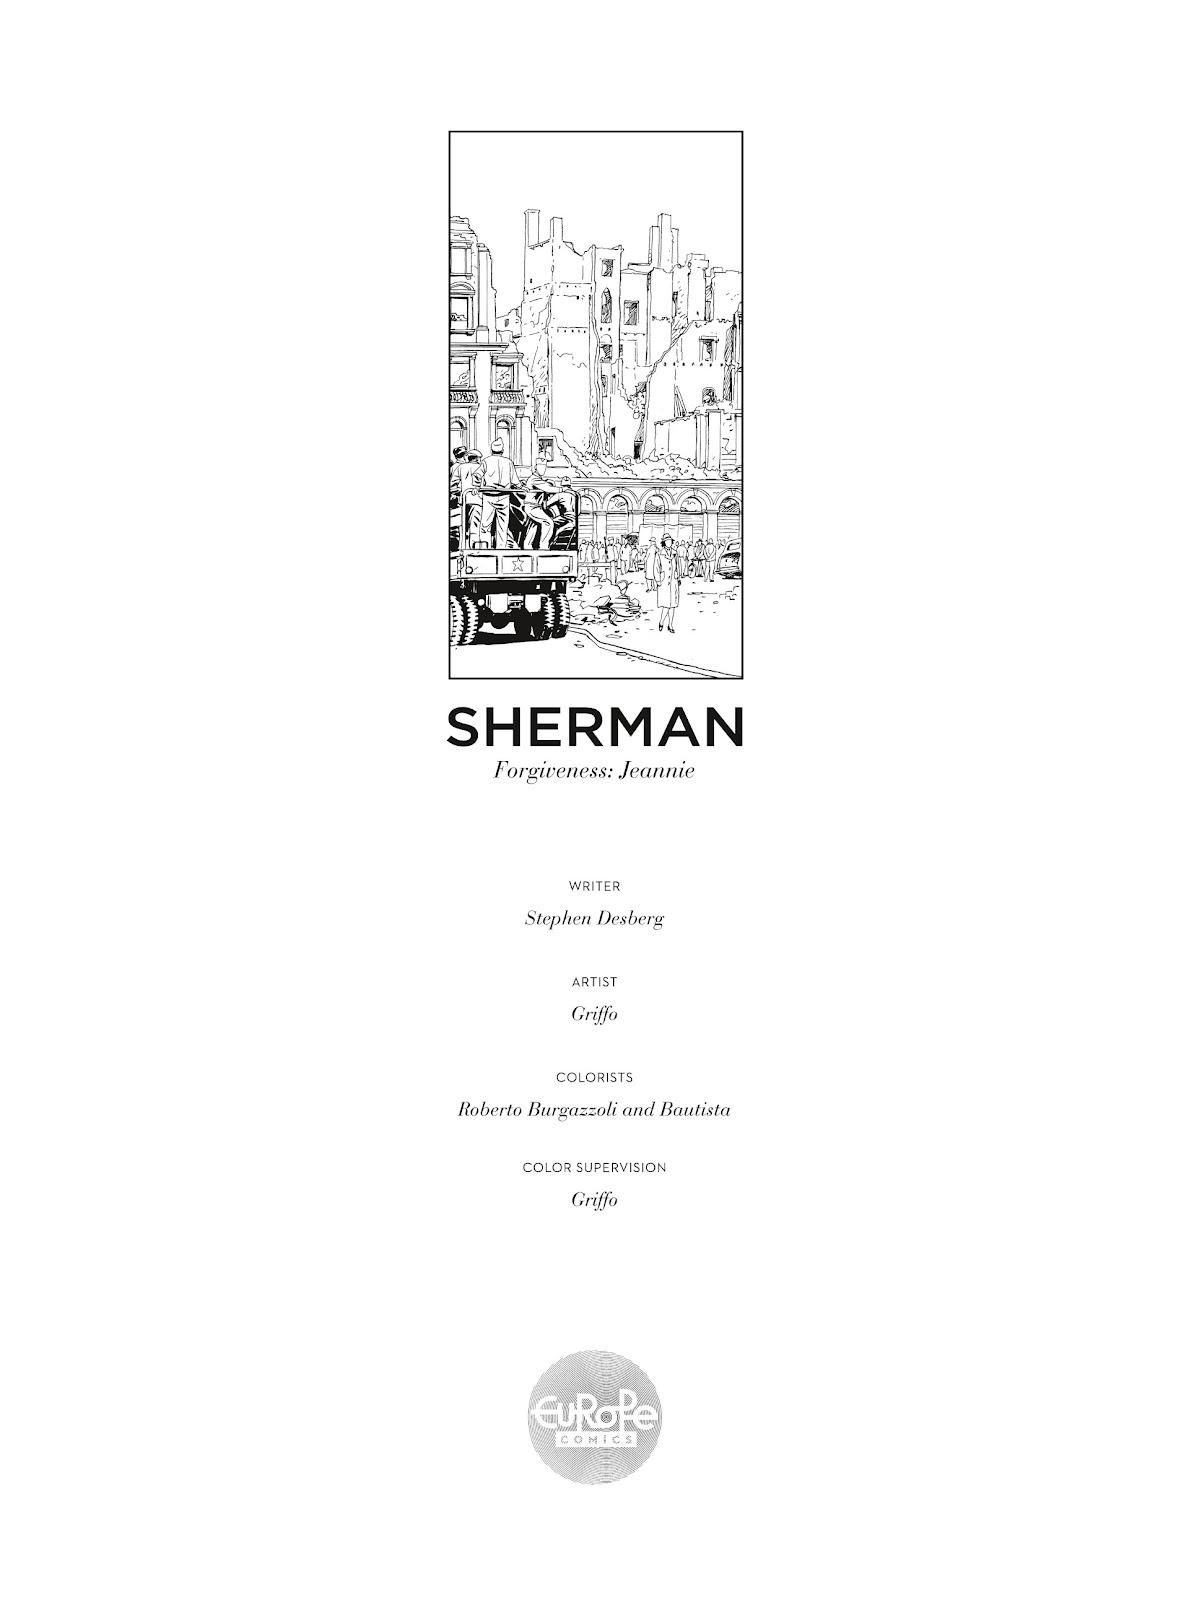 Read online Sherman comic -  Issue #6 - 2